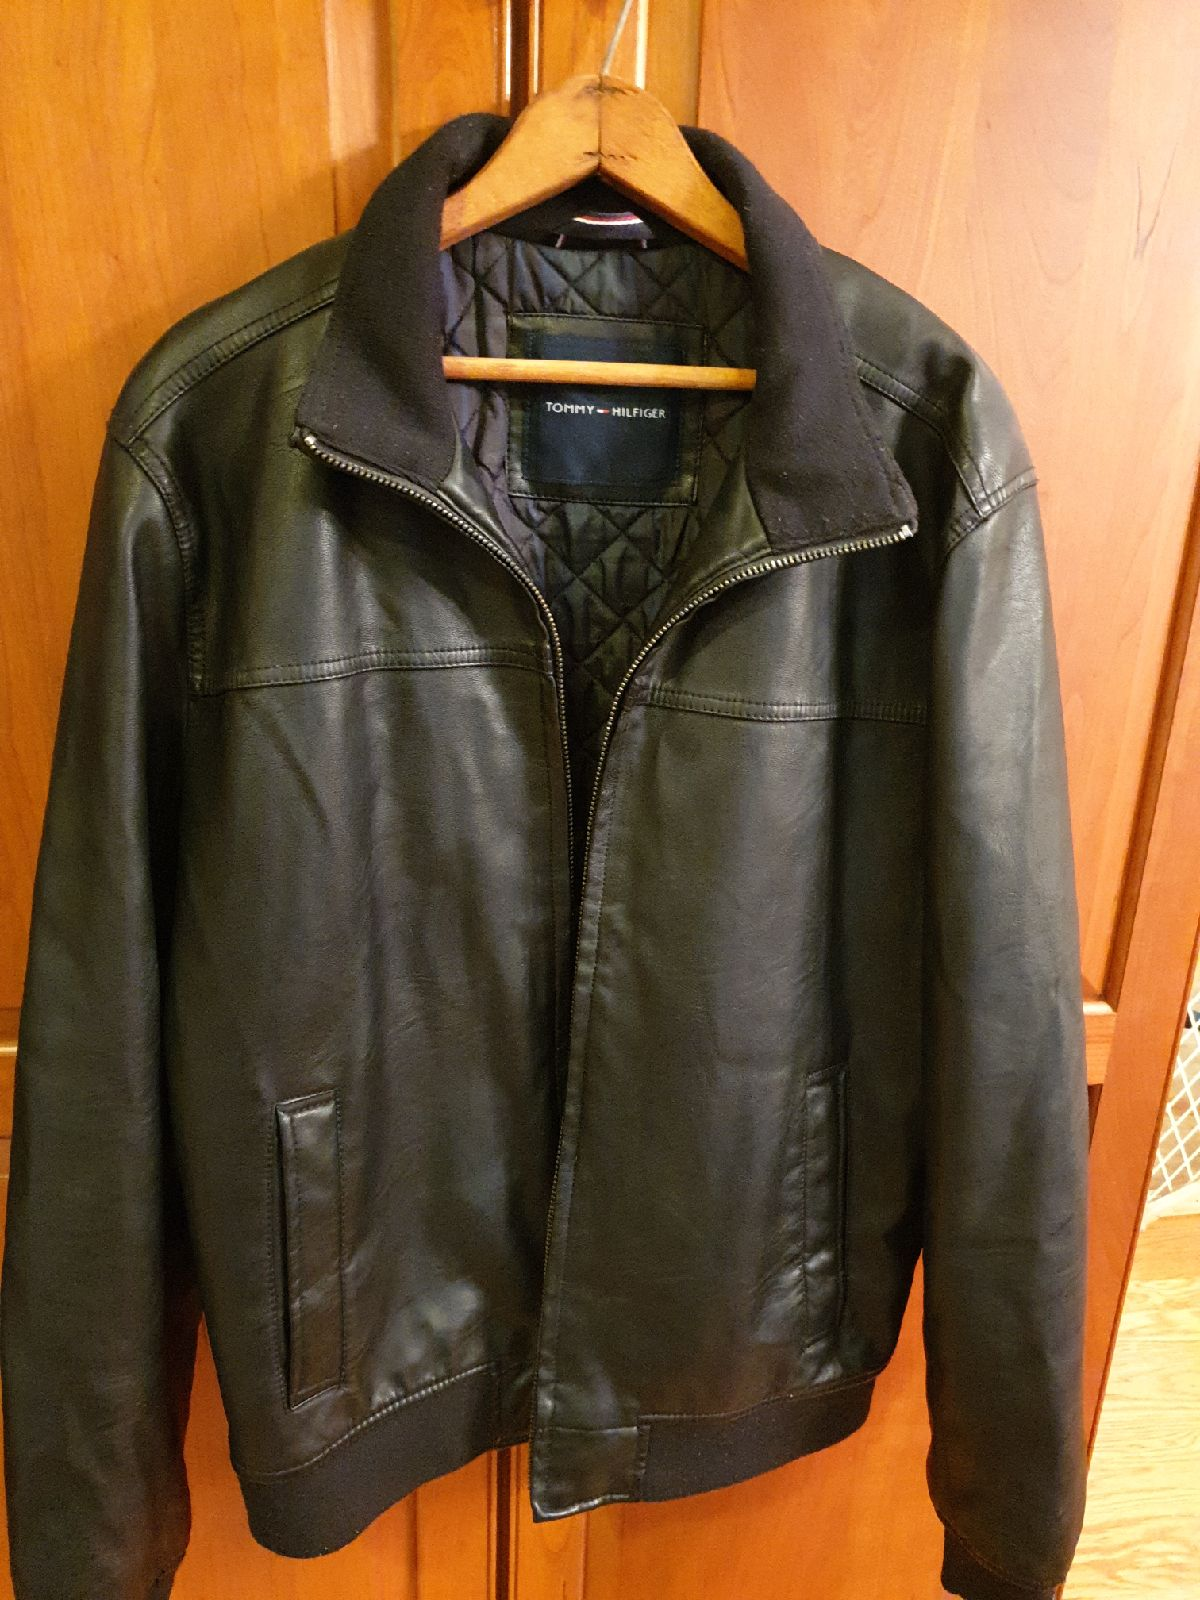 Tommy Hilfiger lined leather jacket